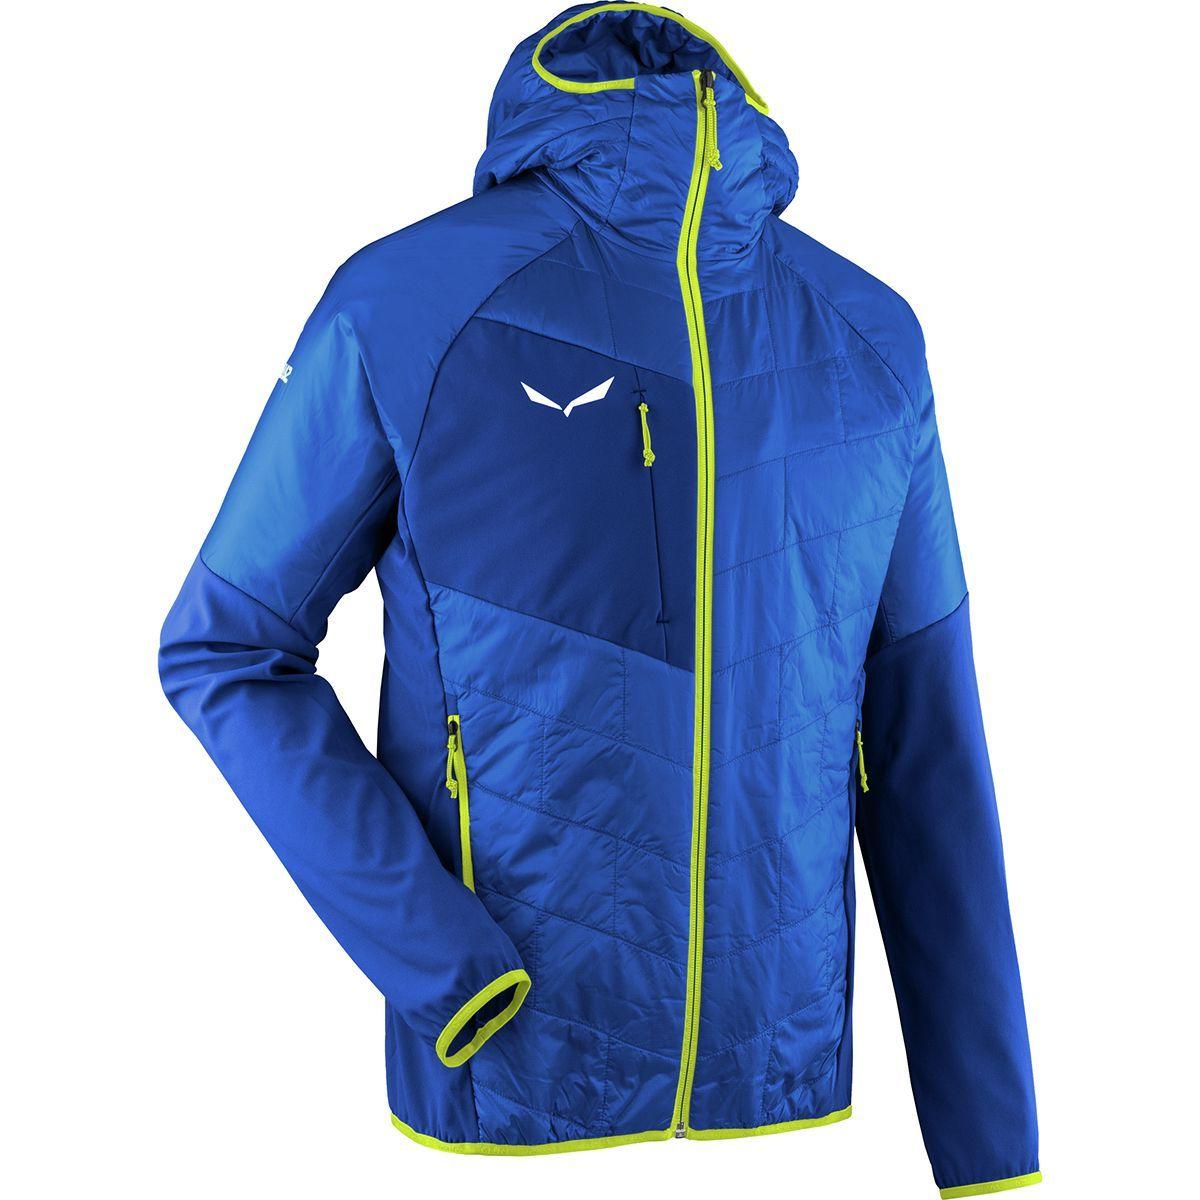 Salewa Ortles Hybrid TW CLT Jacket - Men's